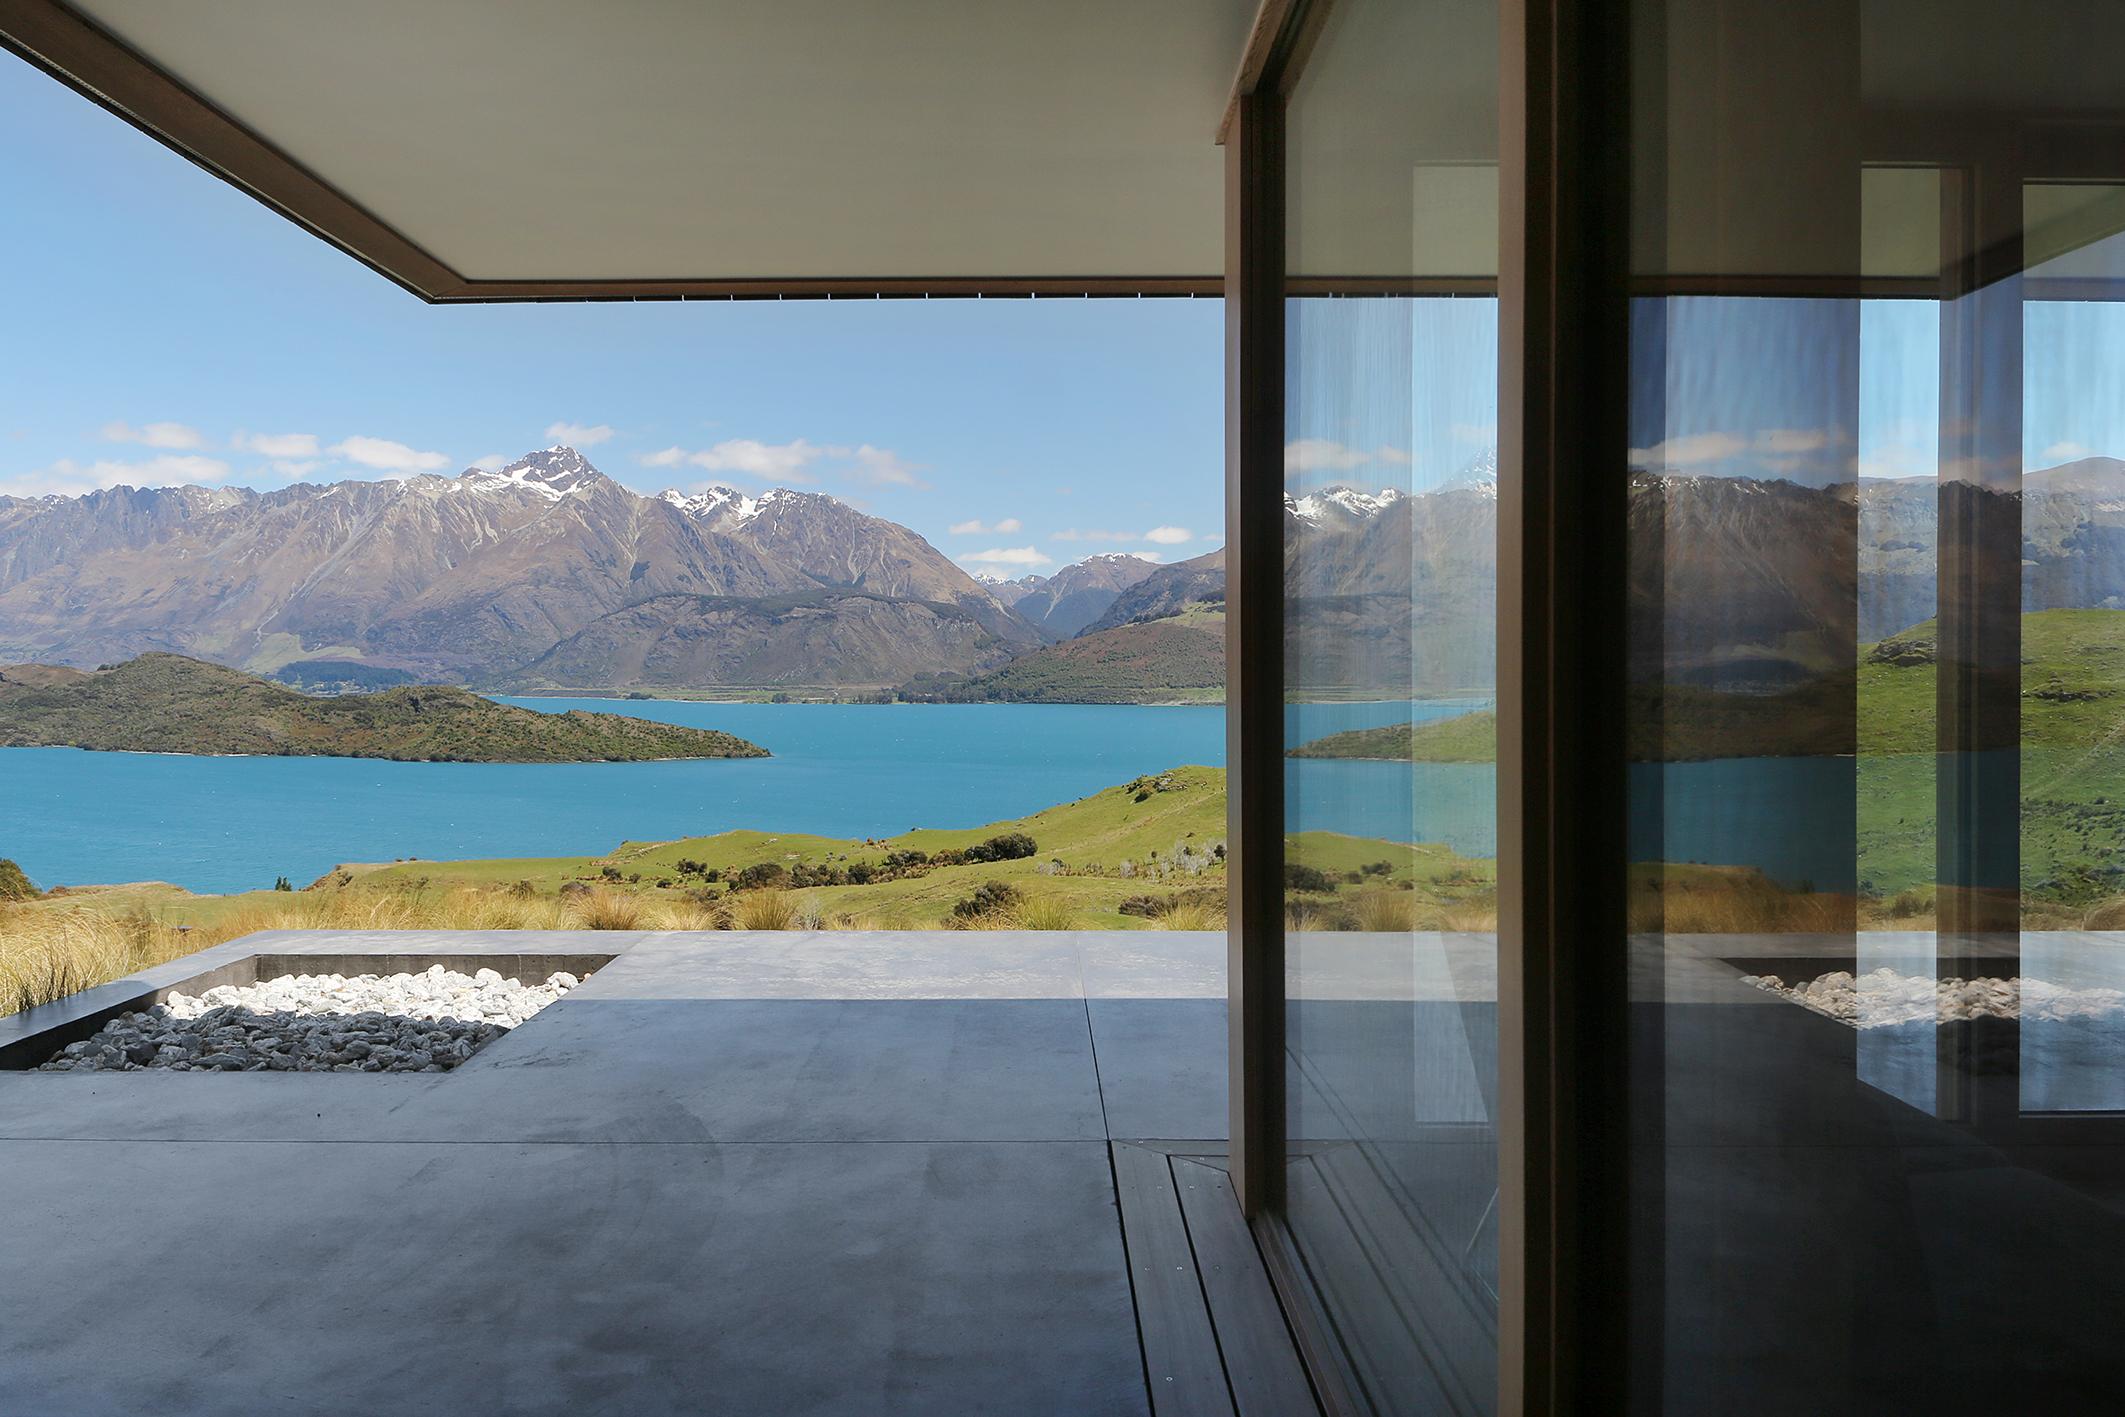 InBedWith_RhiannonTaylor_AroHa_review_newzealand12